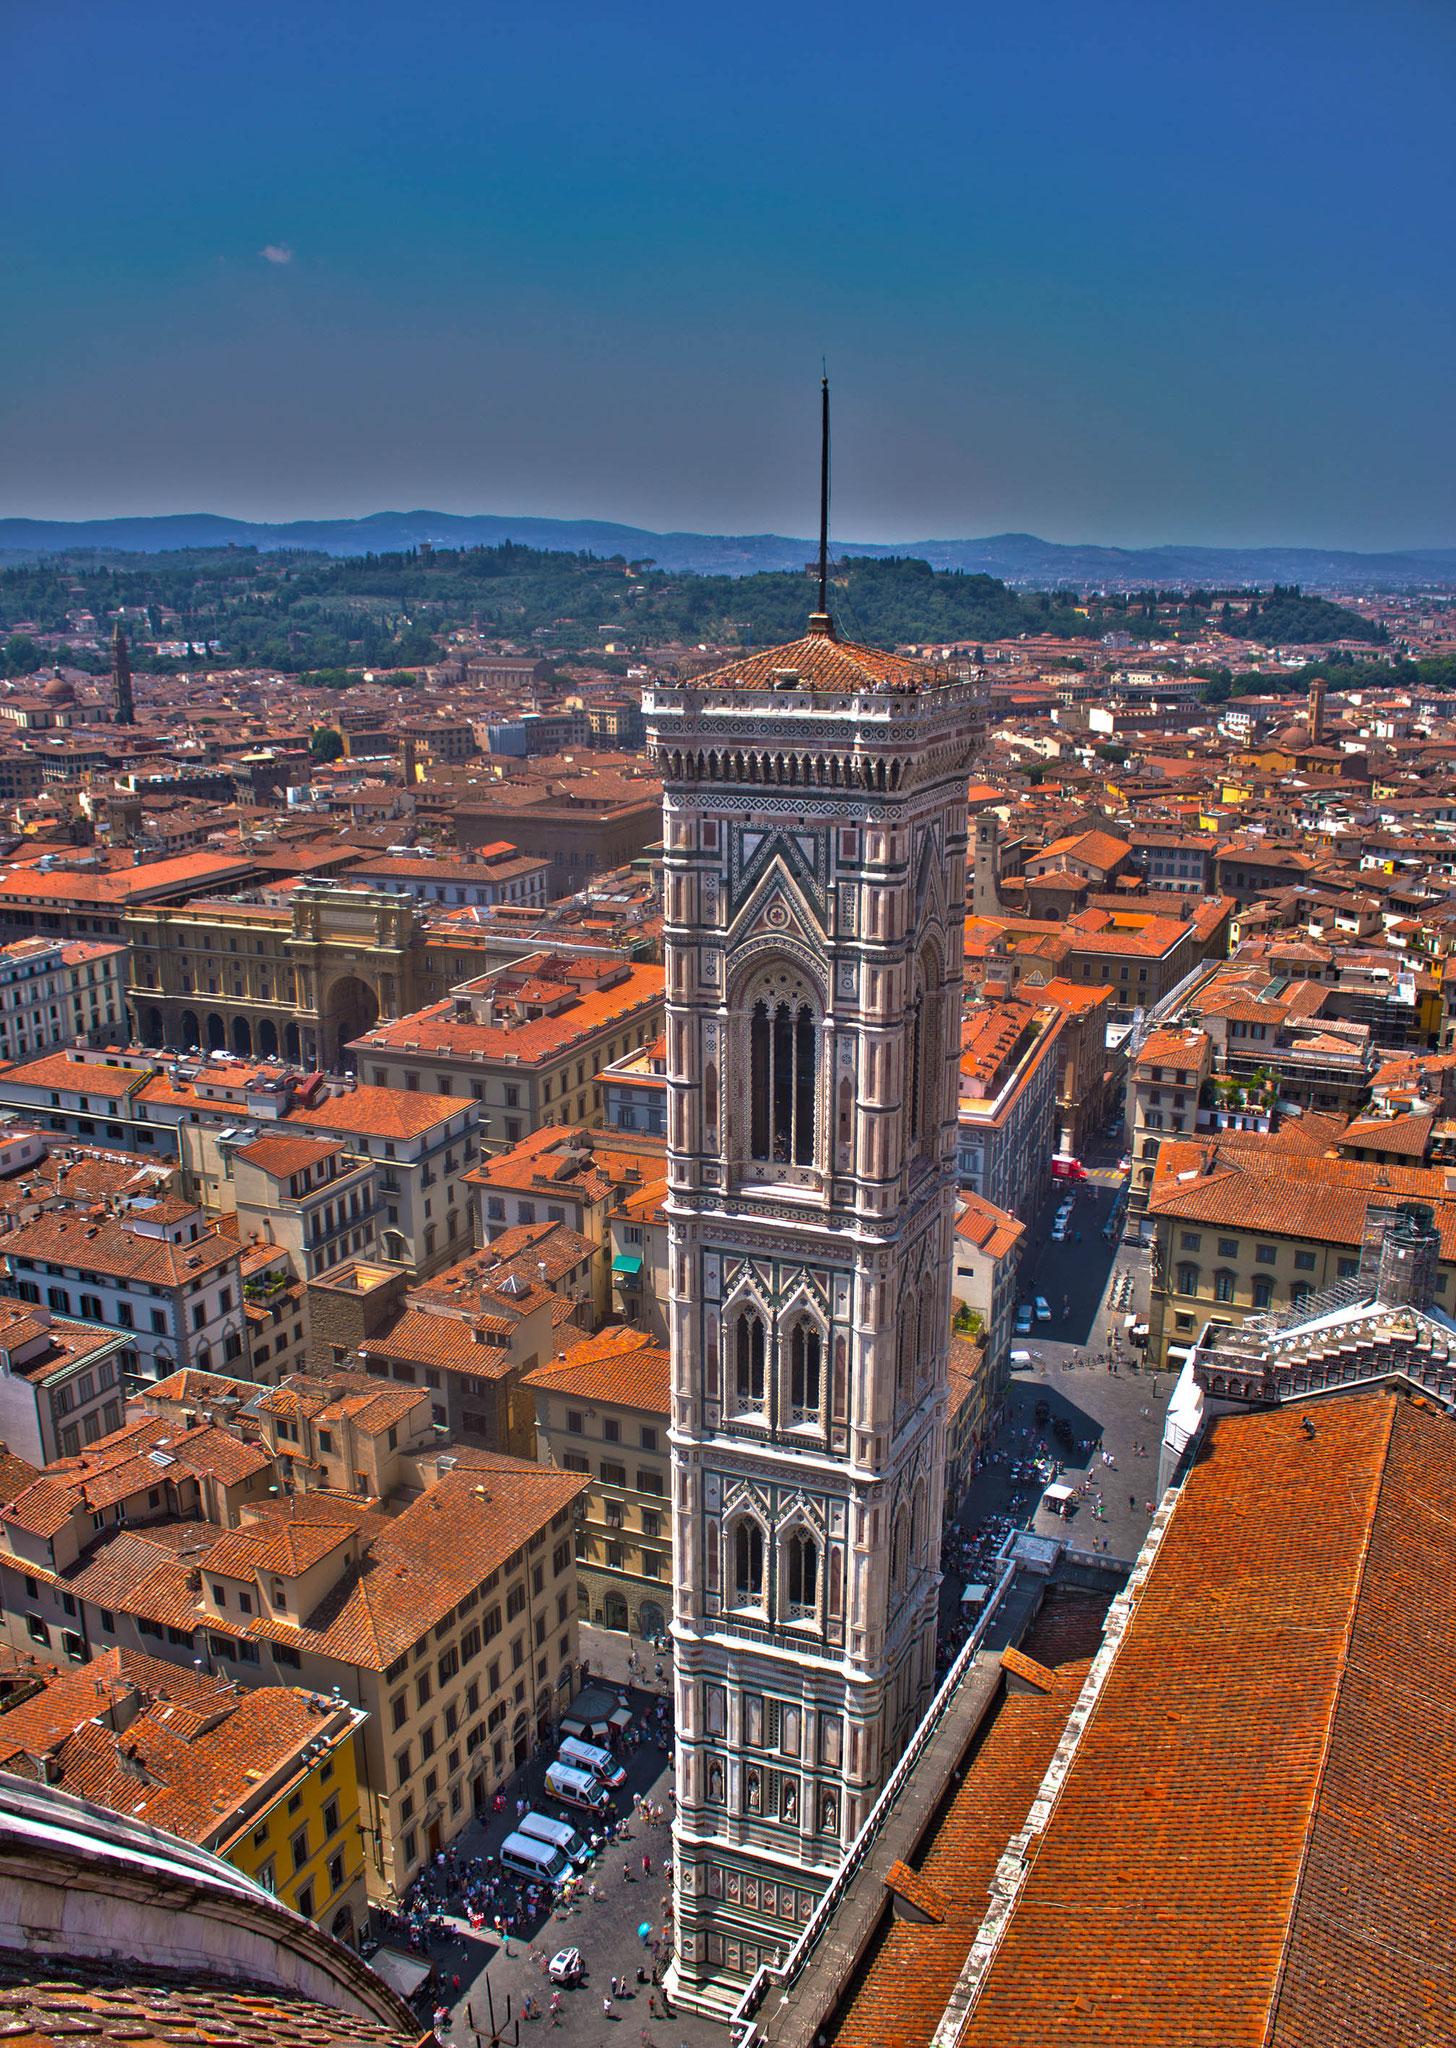 5 - Philippe GOMIS - Firenze - le campanile